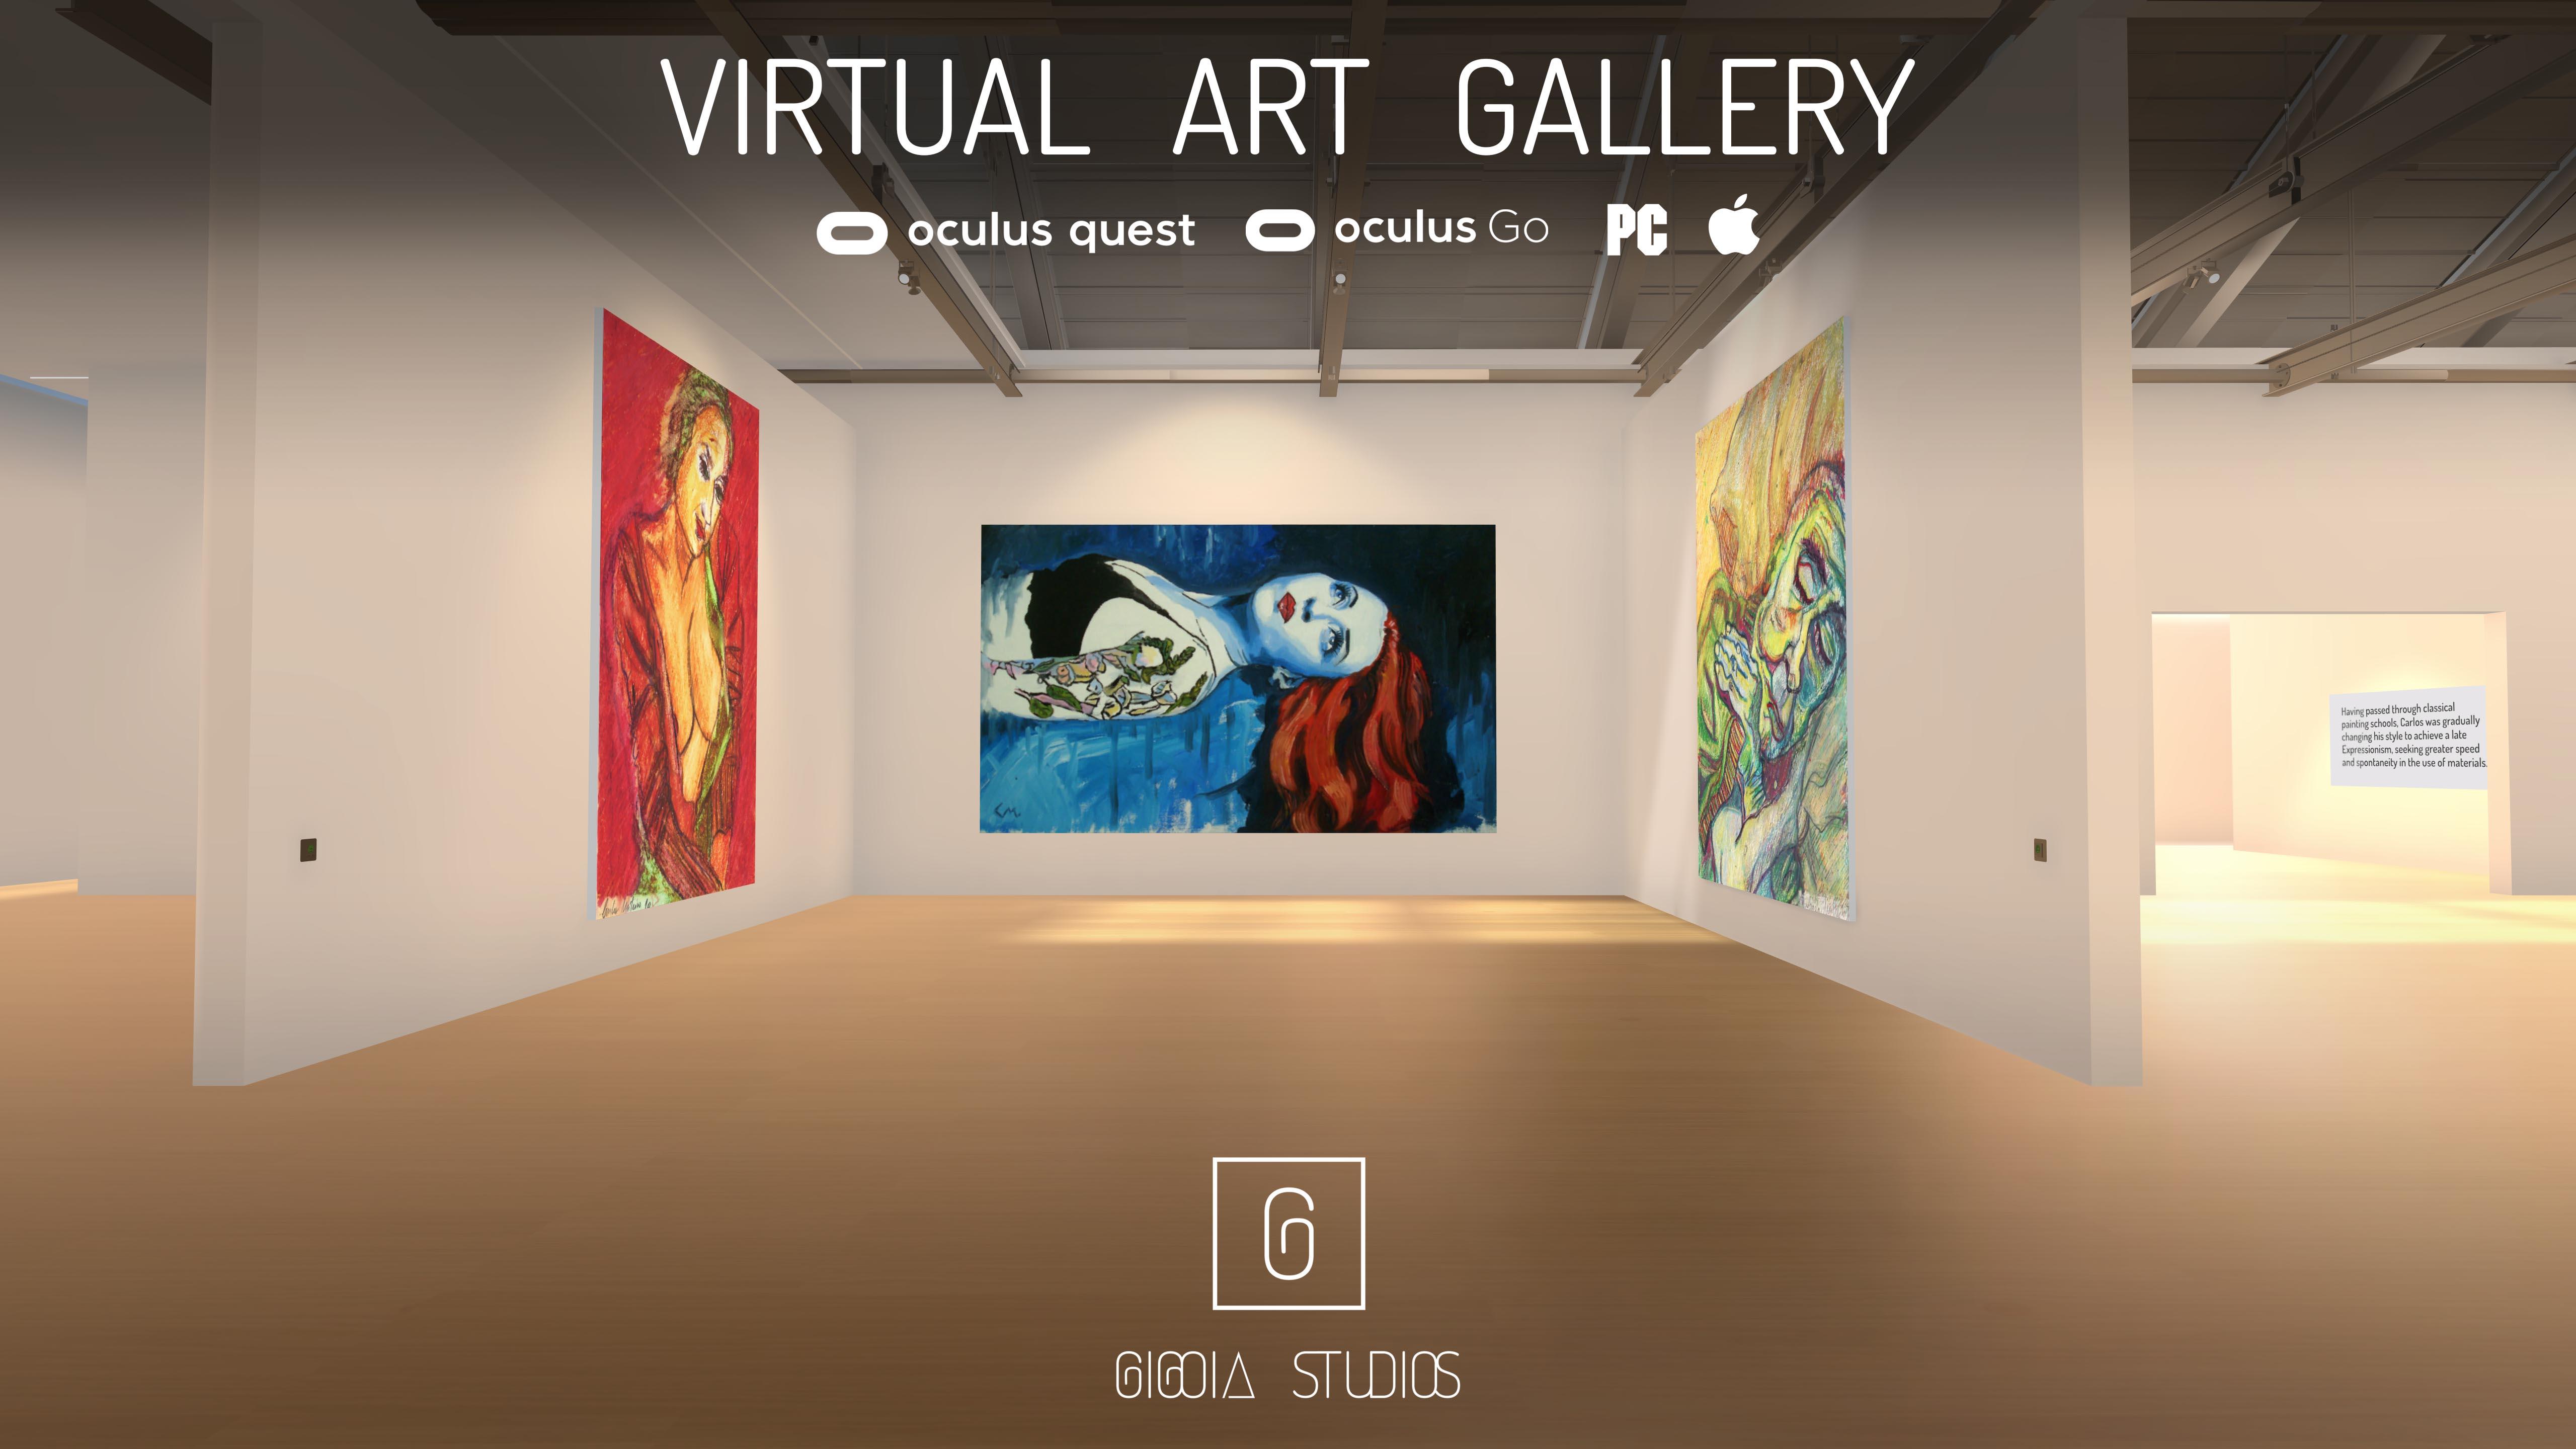 CLASSIC VIRTUAL ART GALLERY